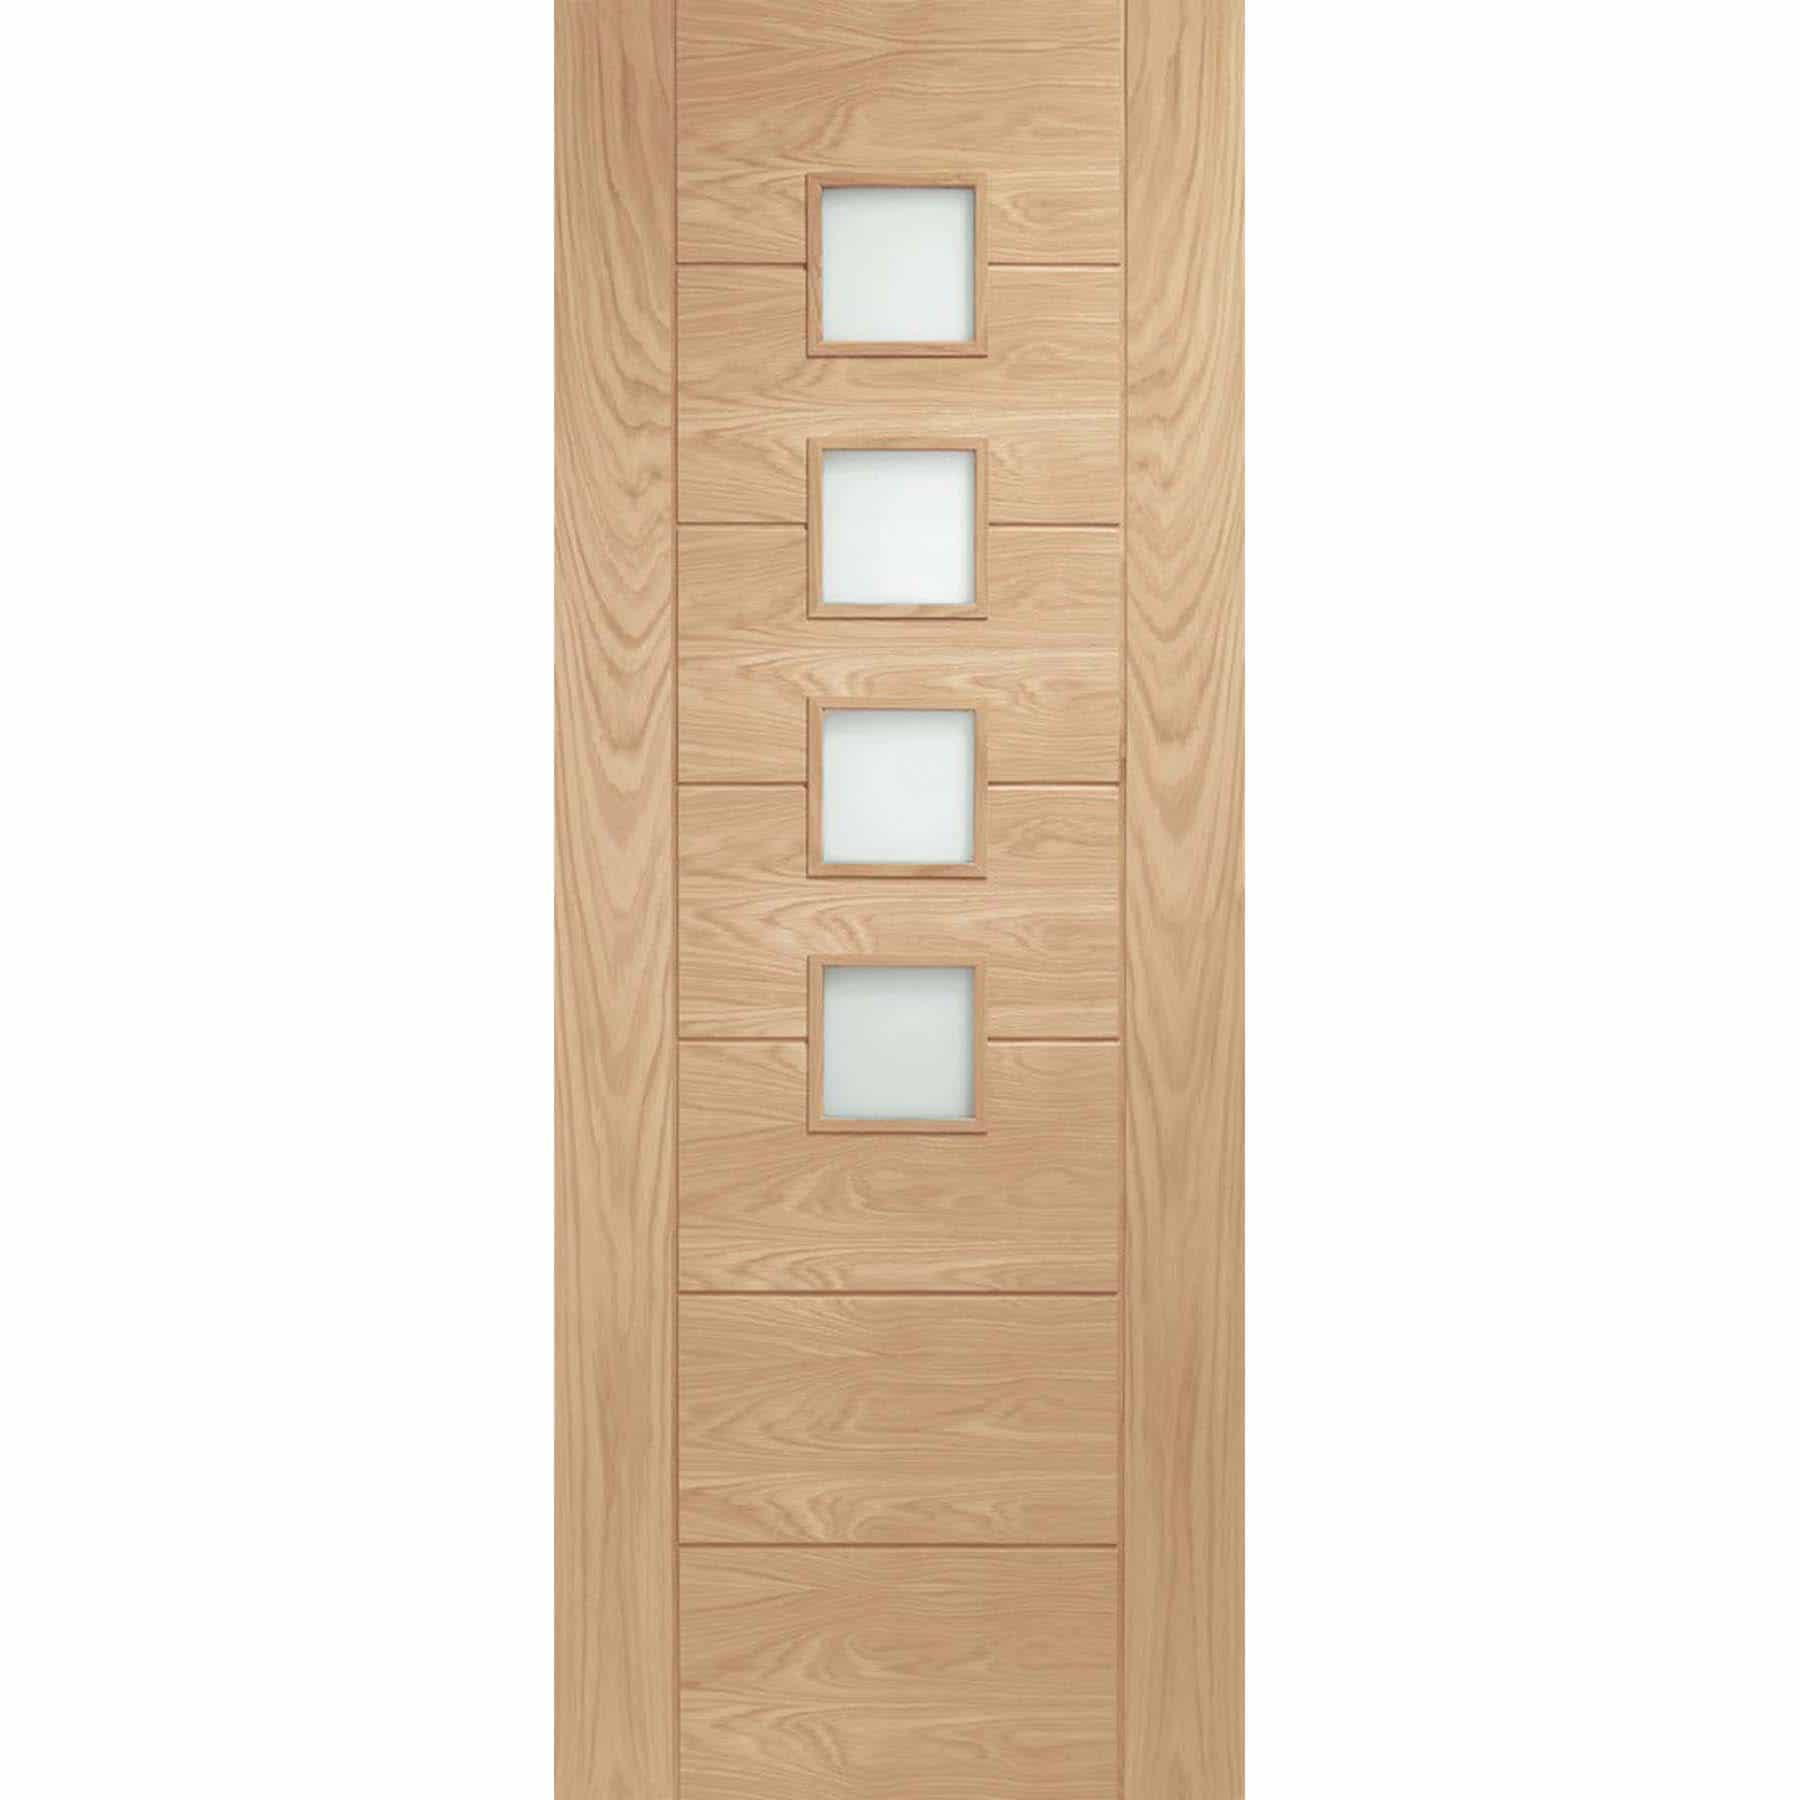 Palermo Oak Fire Door With Obscure Glass Shawfield Doors